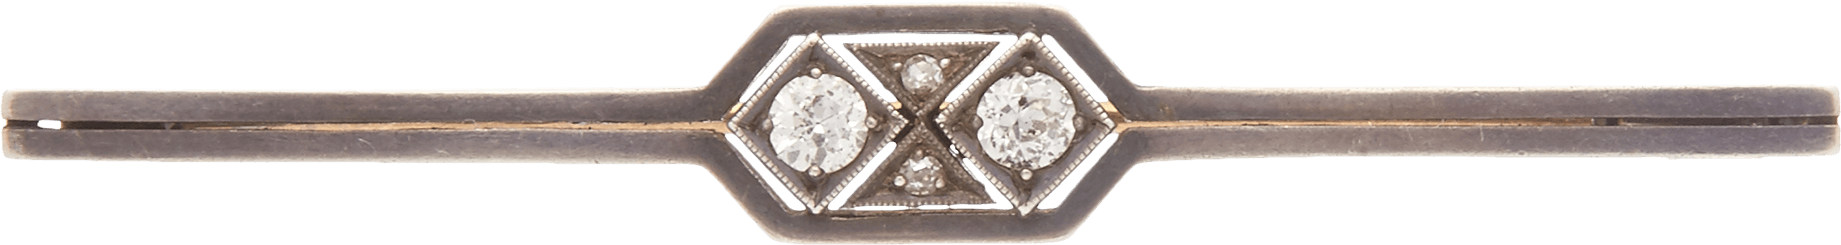 Антикварная брошь с бриллиантами